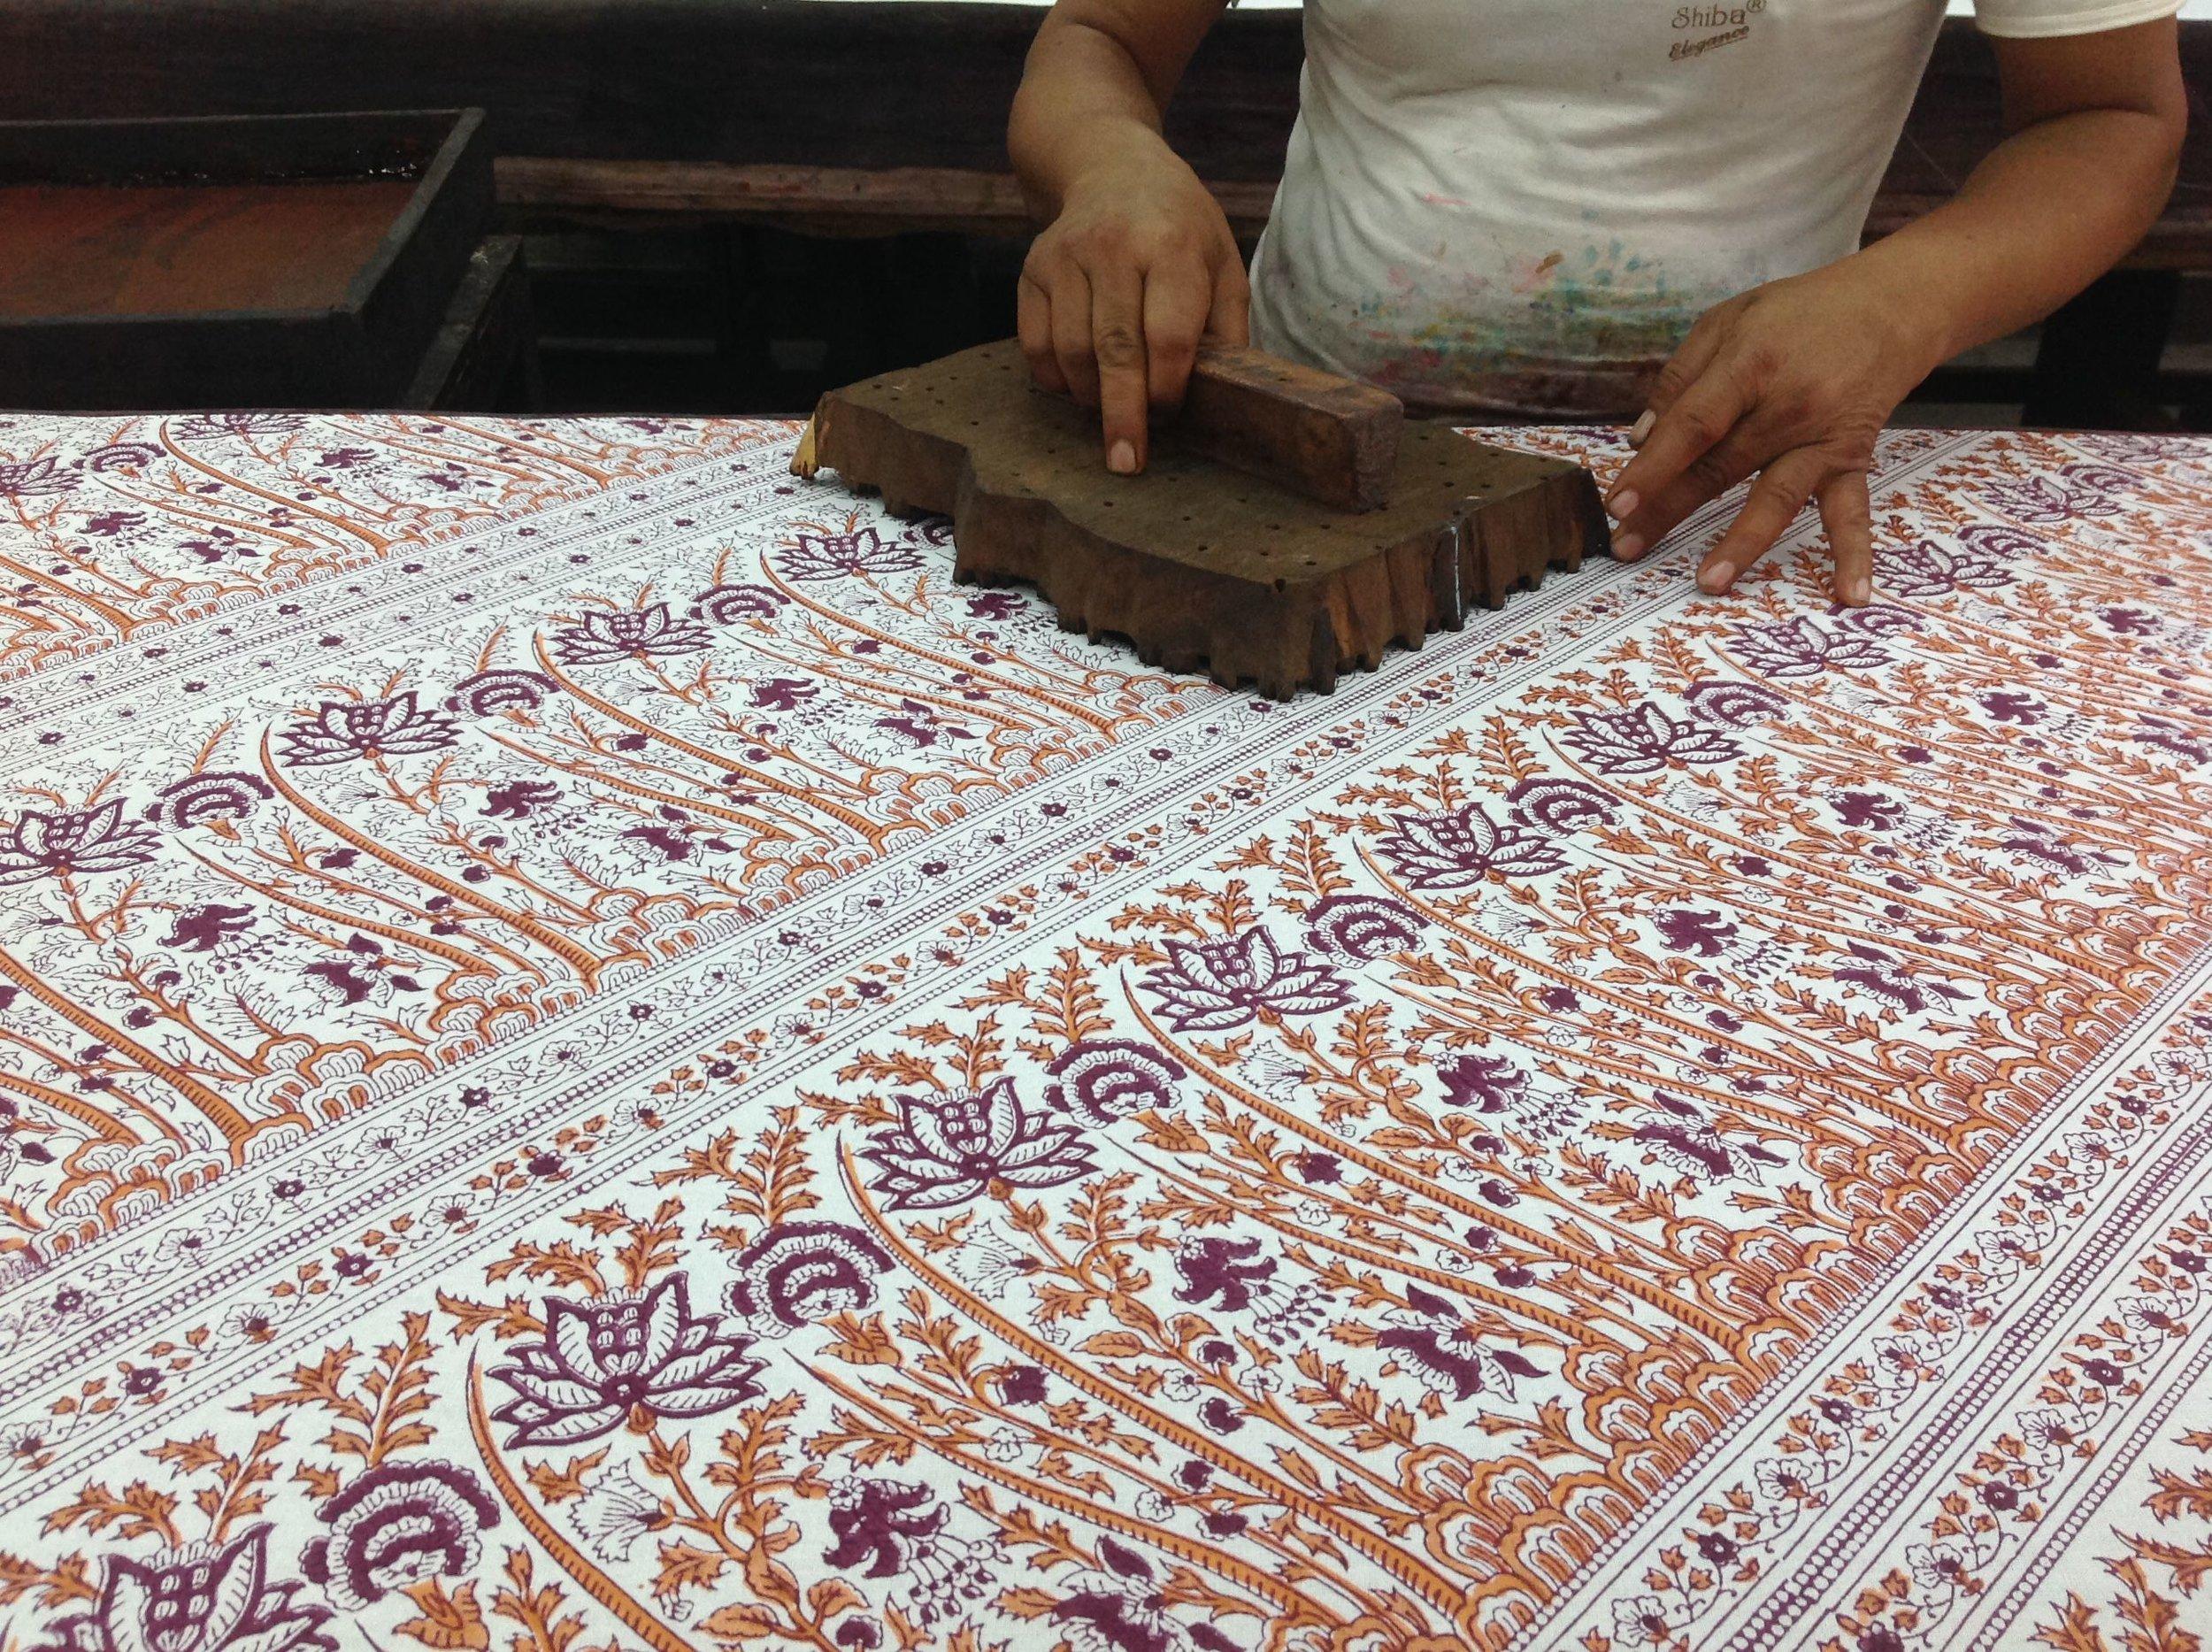 Printing The Fabric